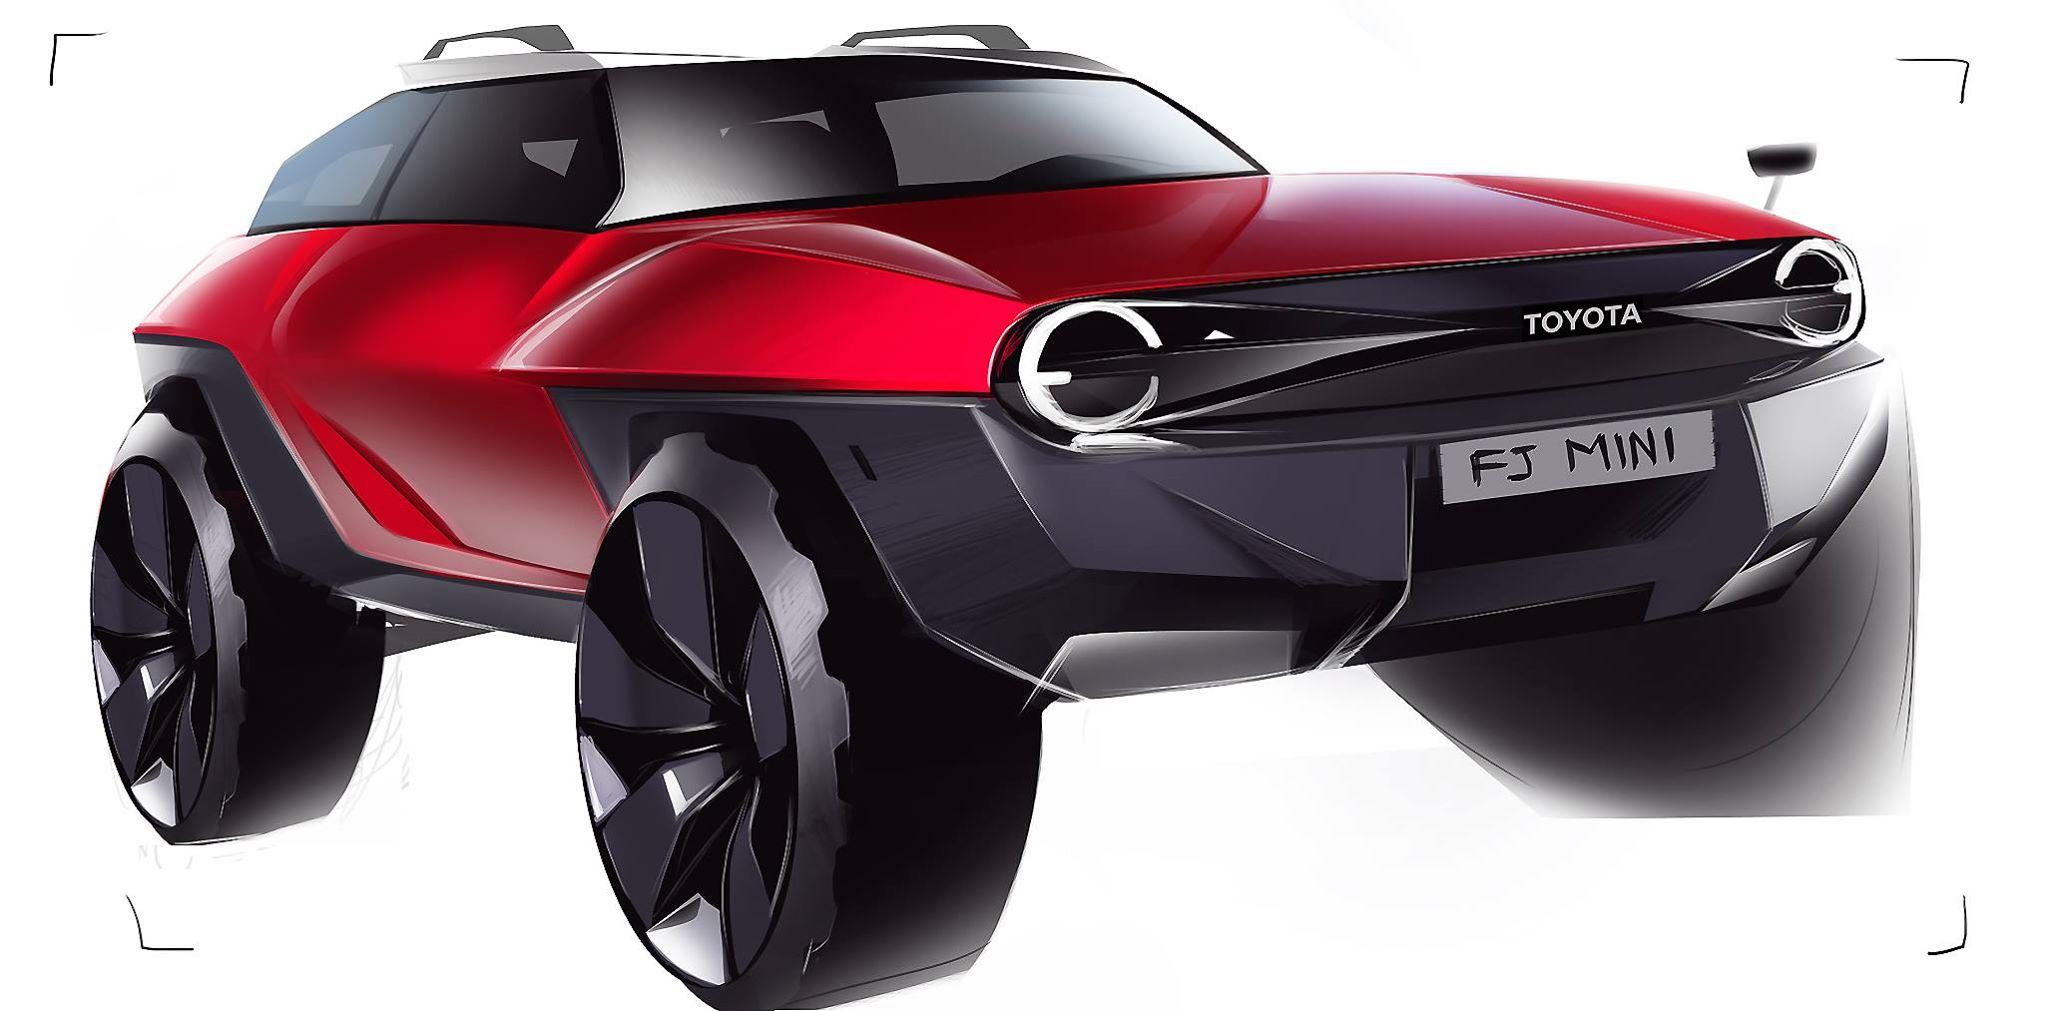 Toyota Of Alvin >> Toyota Mini Fj Cruiser Design Sketch By Alvin Tseng Accd Trans